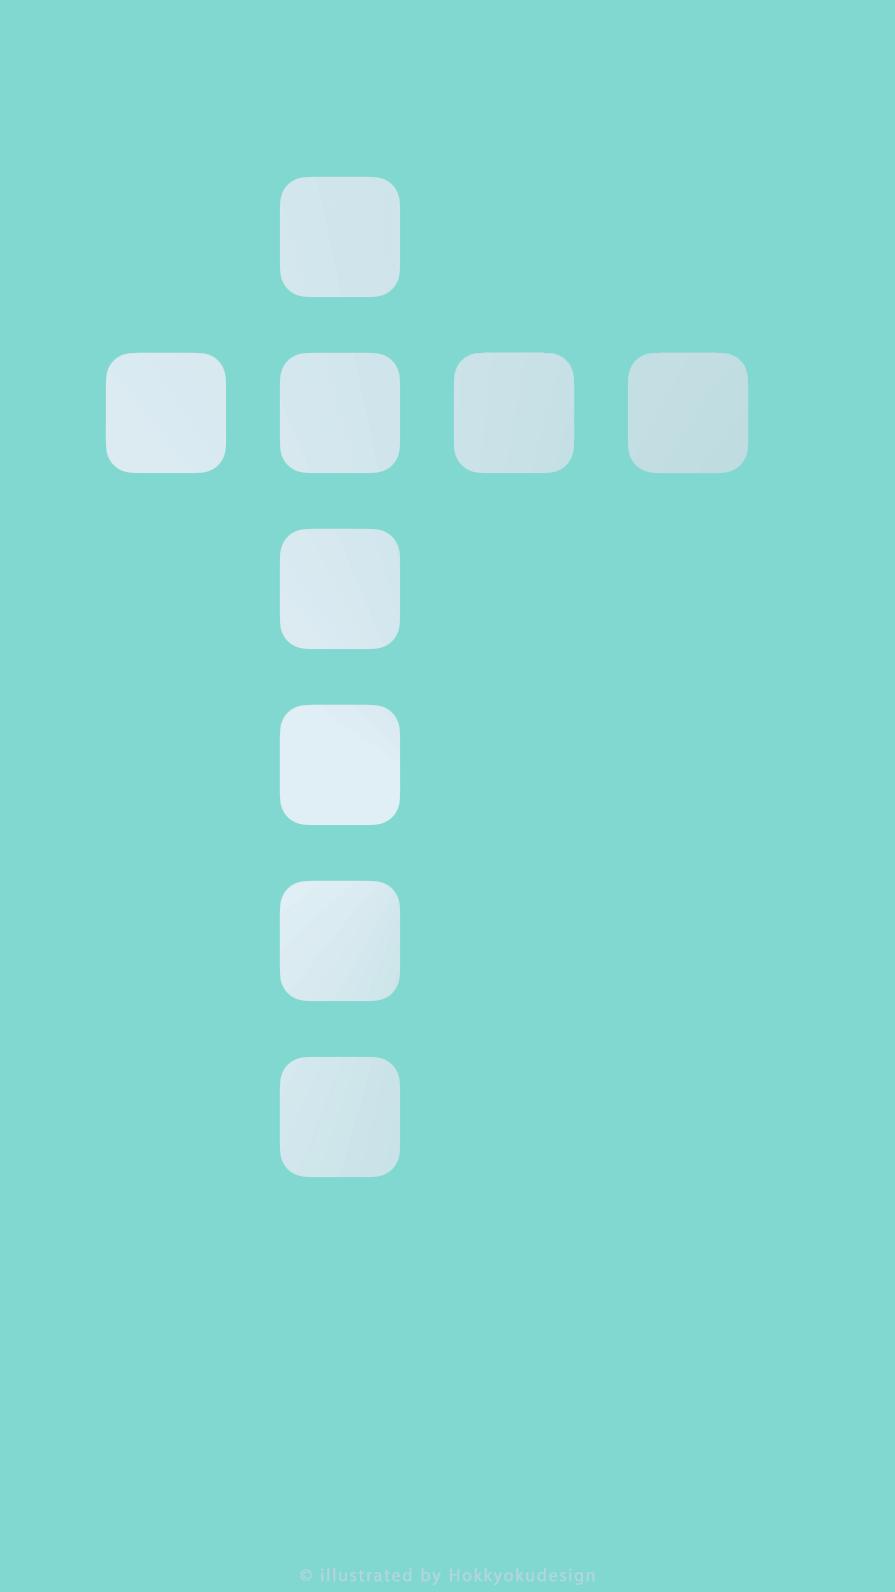 Iphone8 7 6s 6用 ブルーボックス壁紙c Shelf Wallpaper Bluebox Iphone